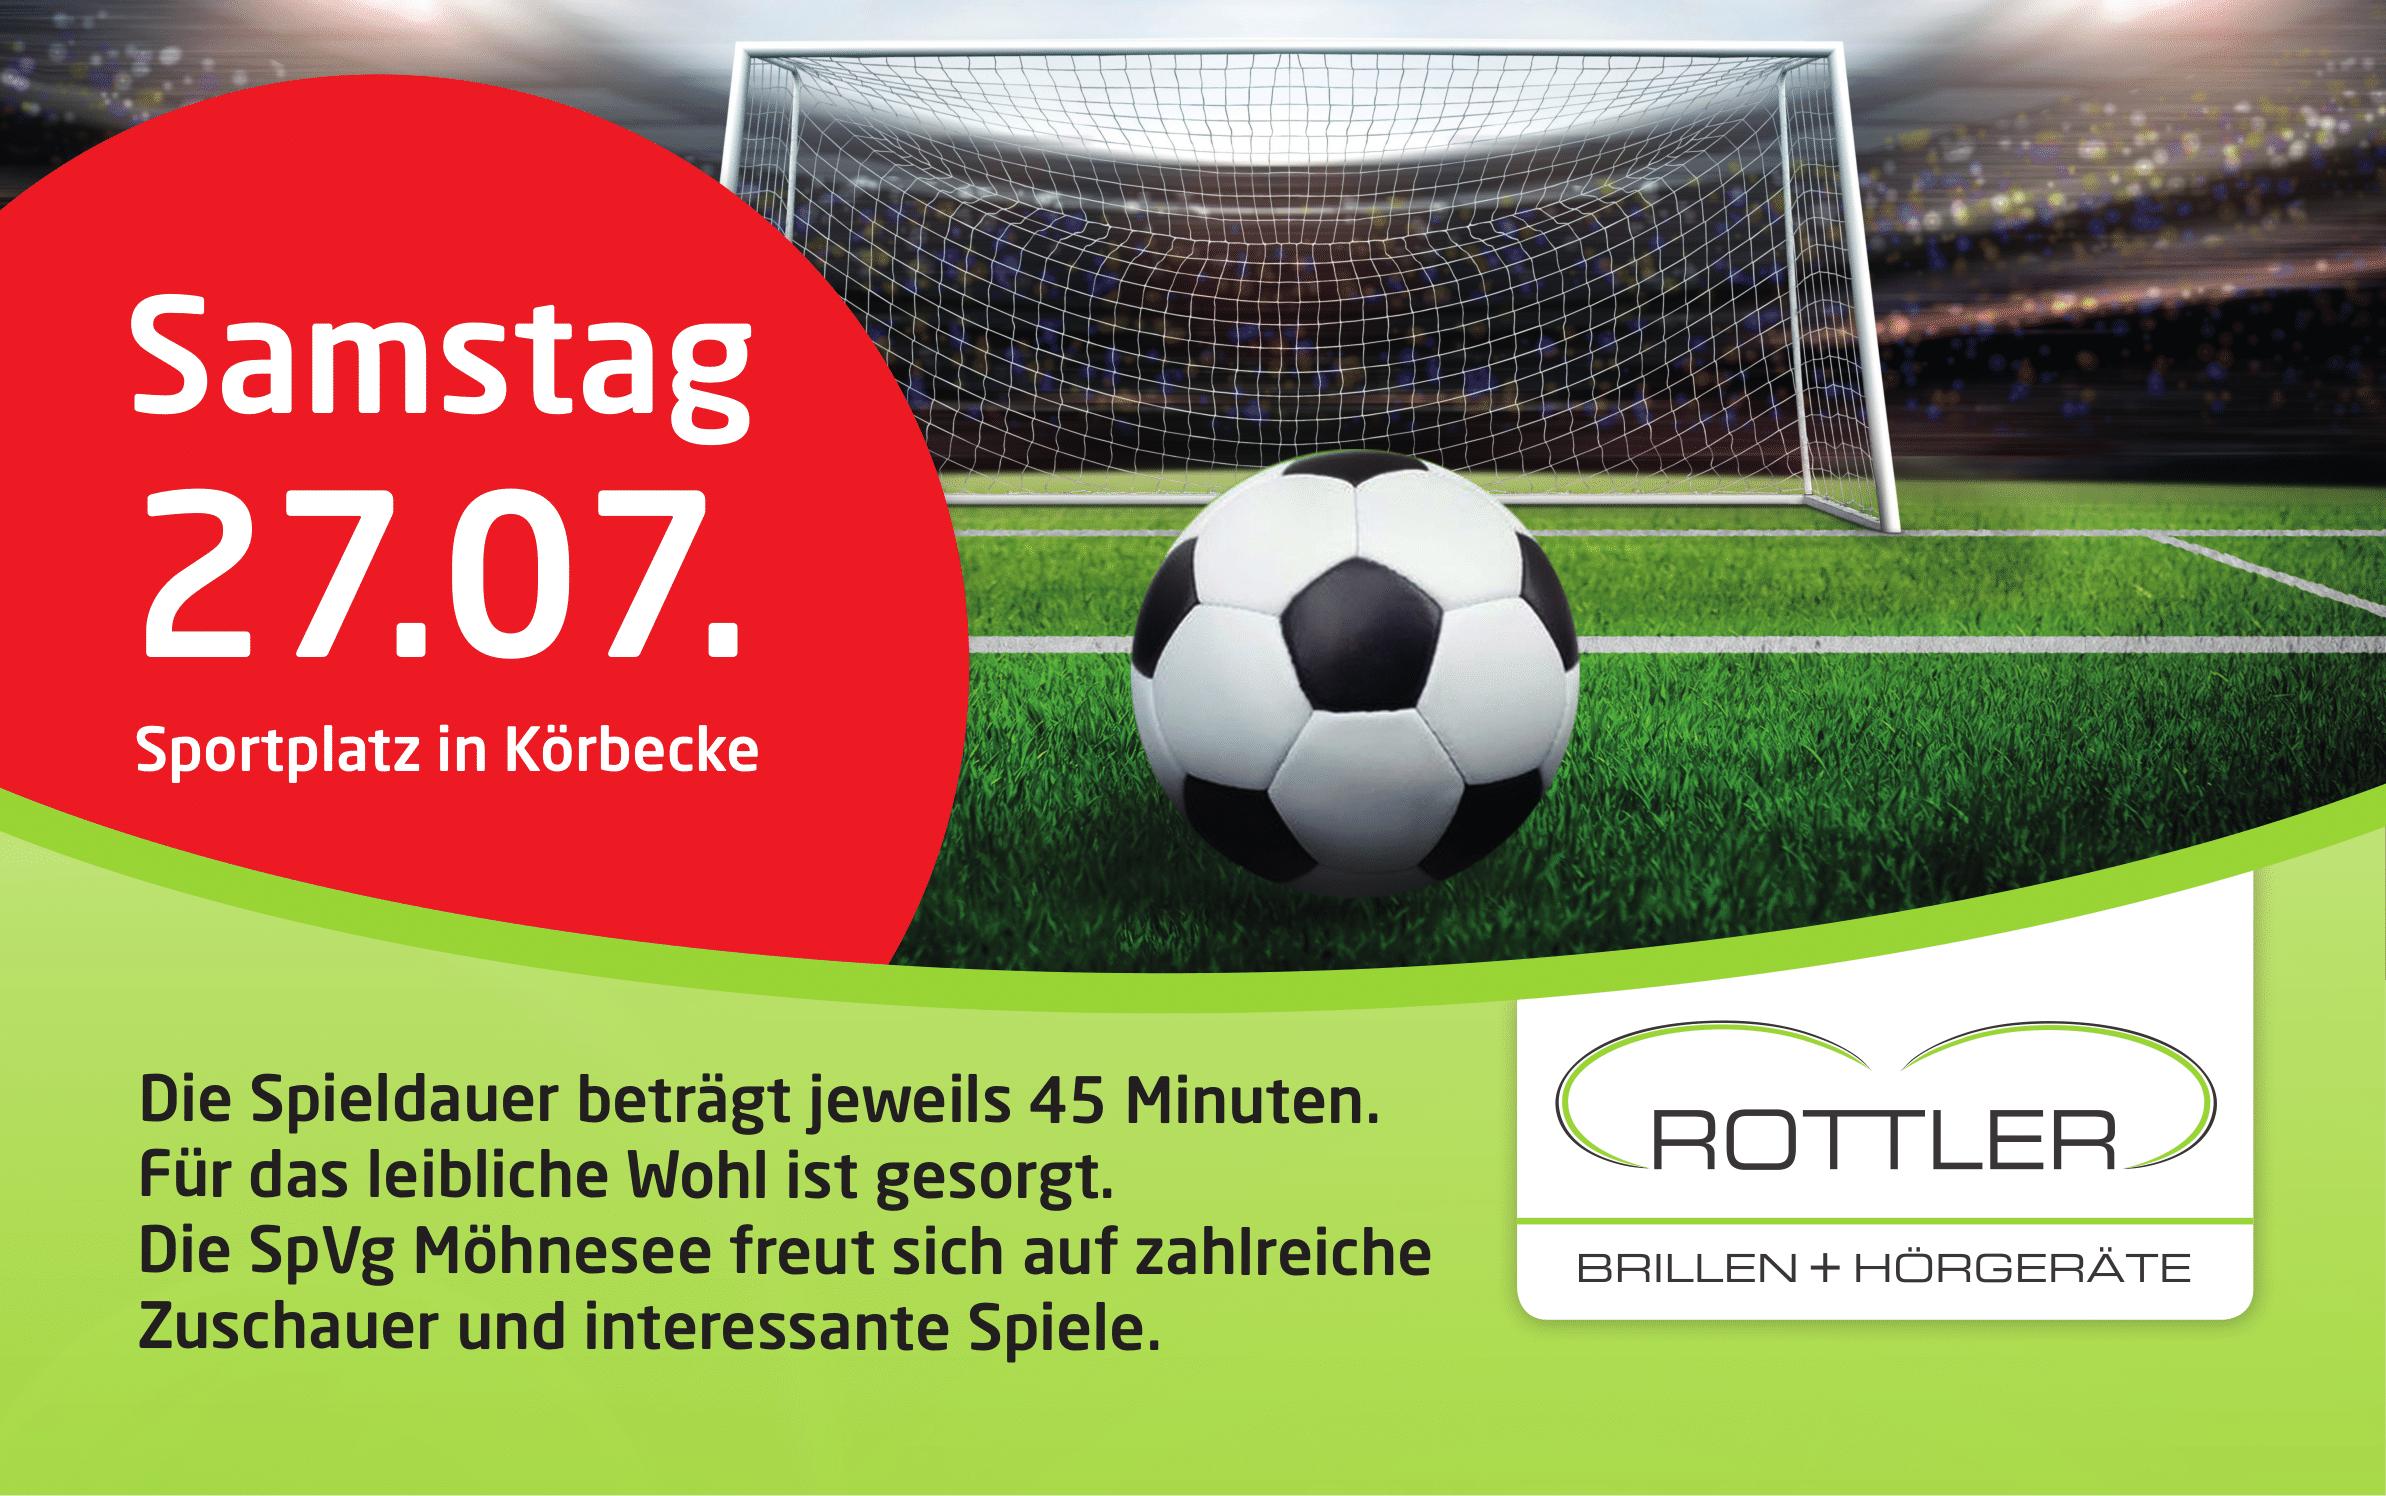 3. Rottler-Cup am Samstag